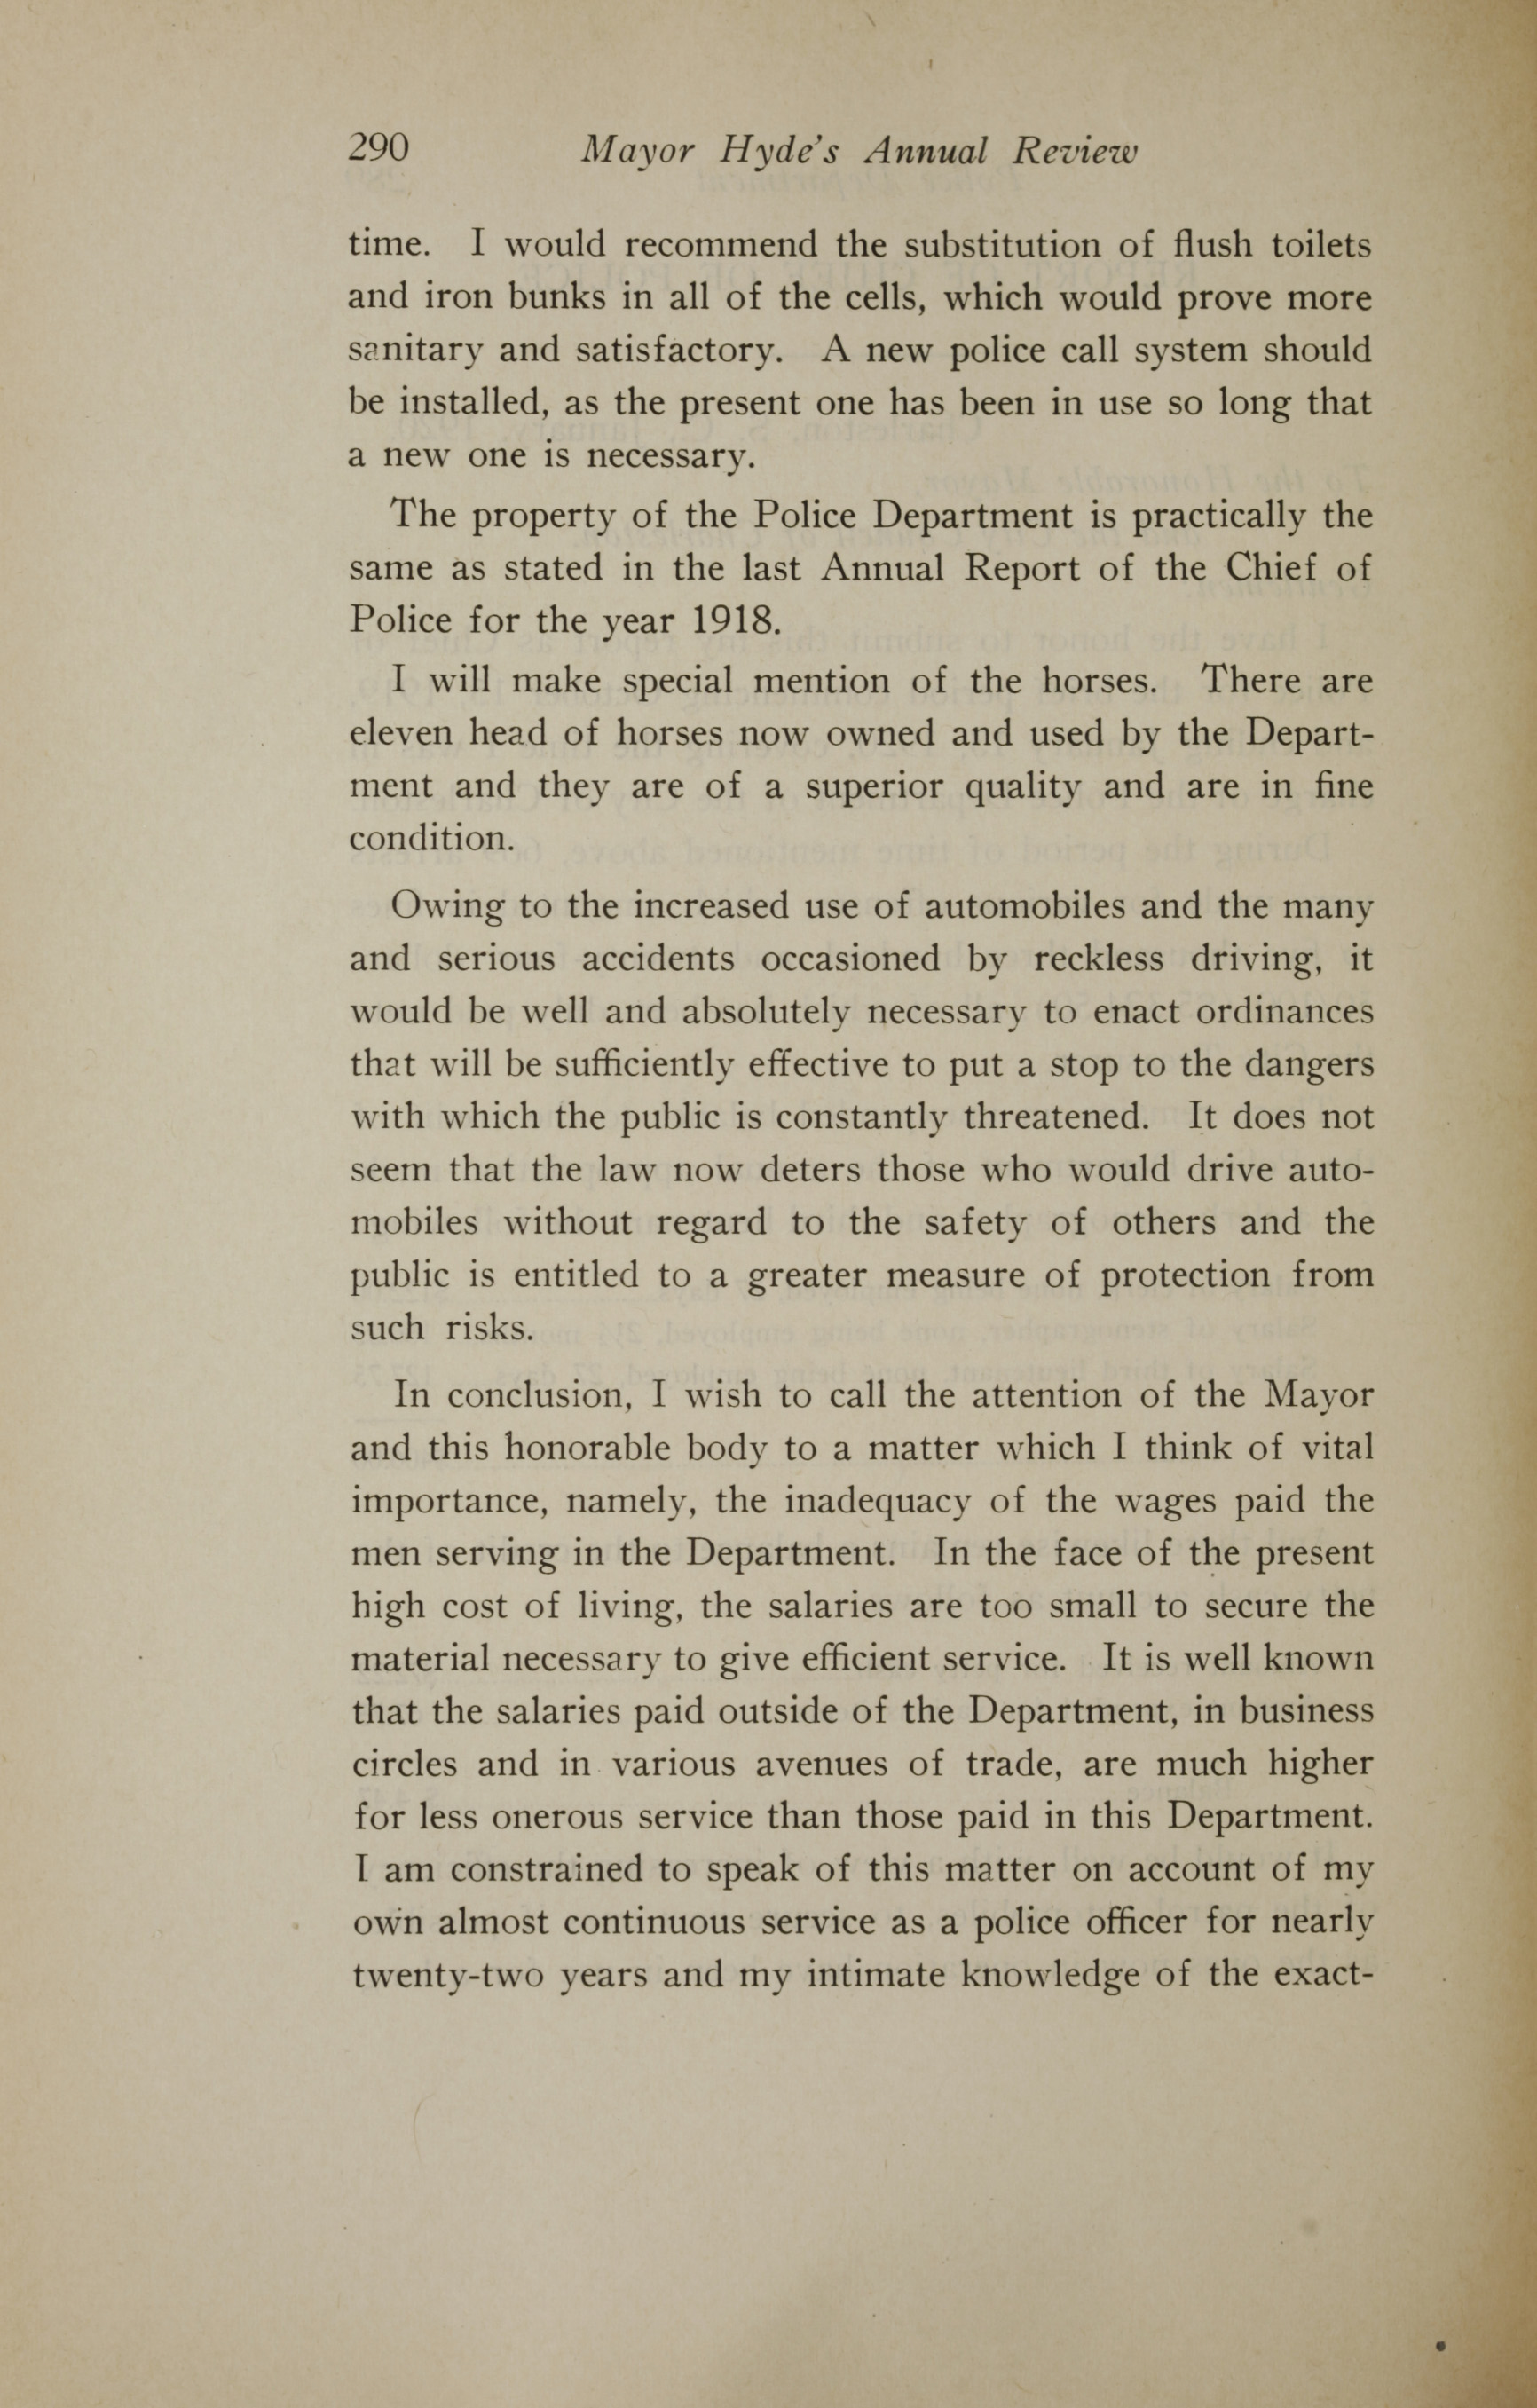 Charleston Yearbook, 1919, page 290